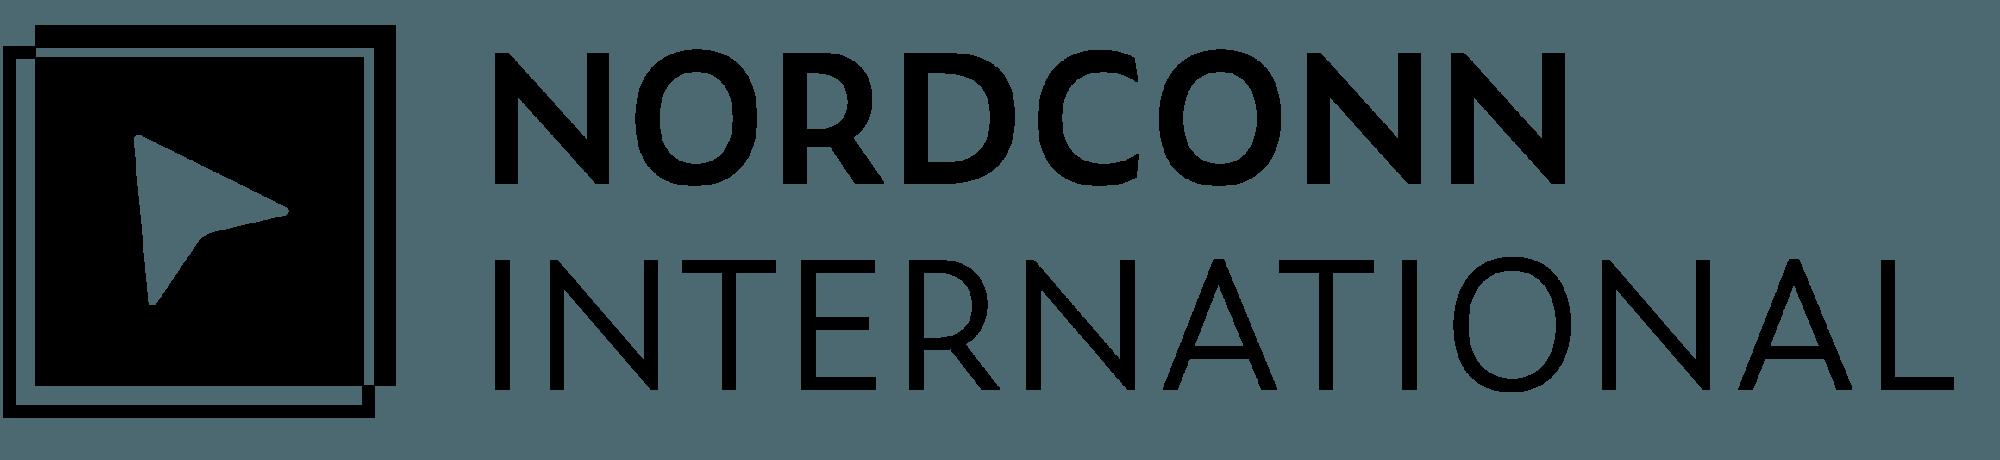 logo-nordconn-black